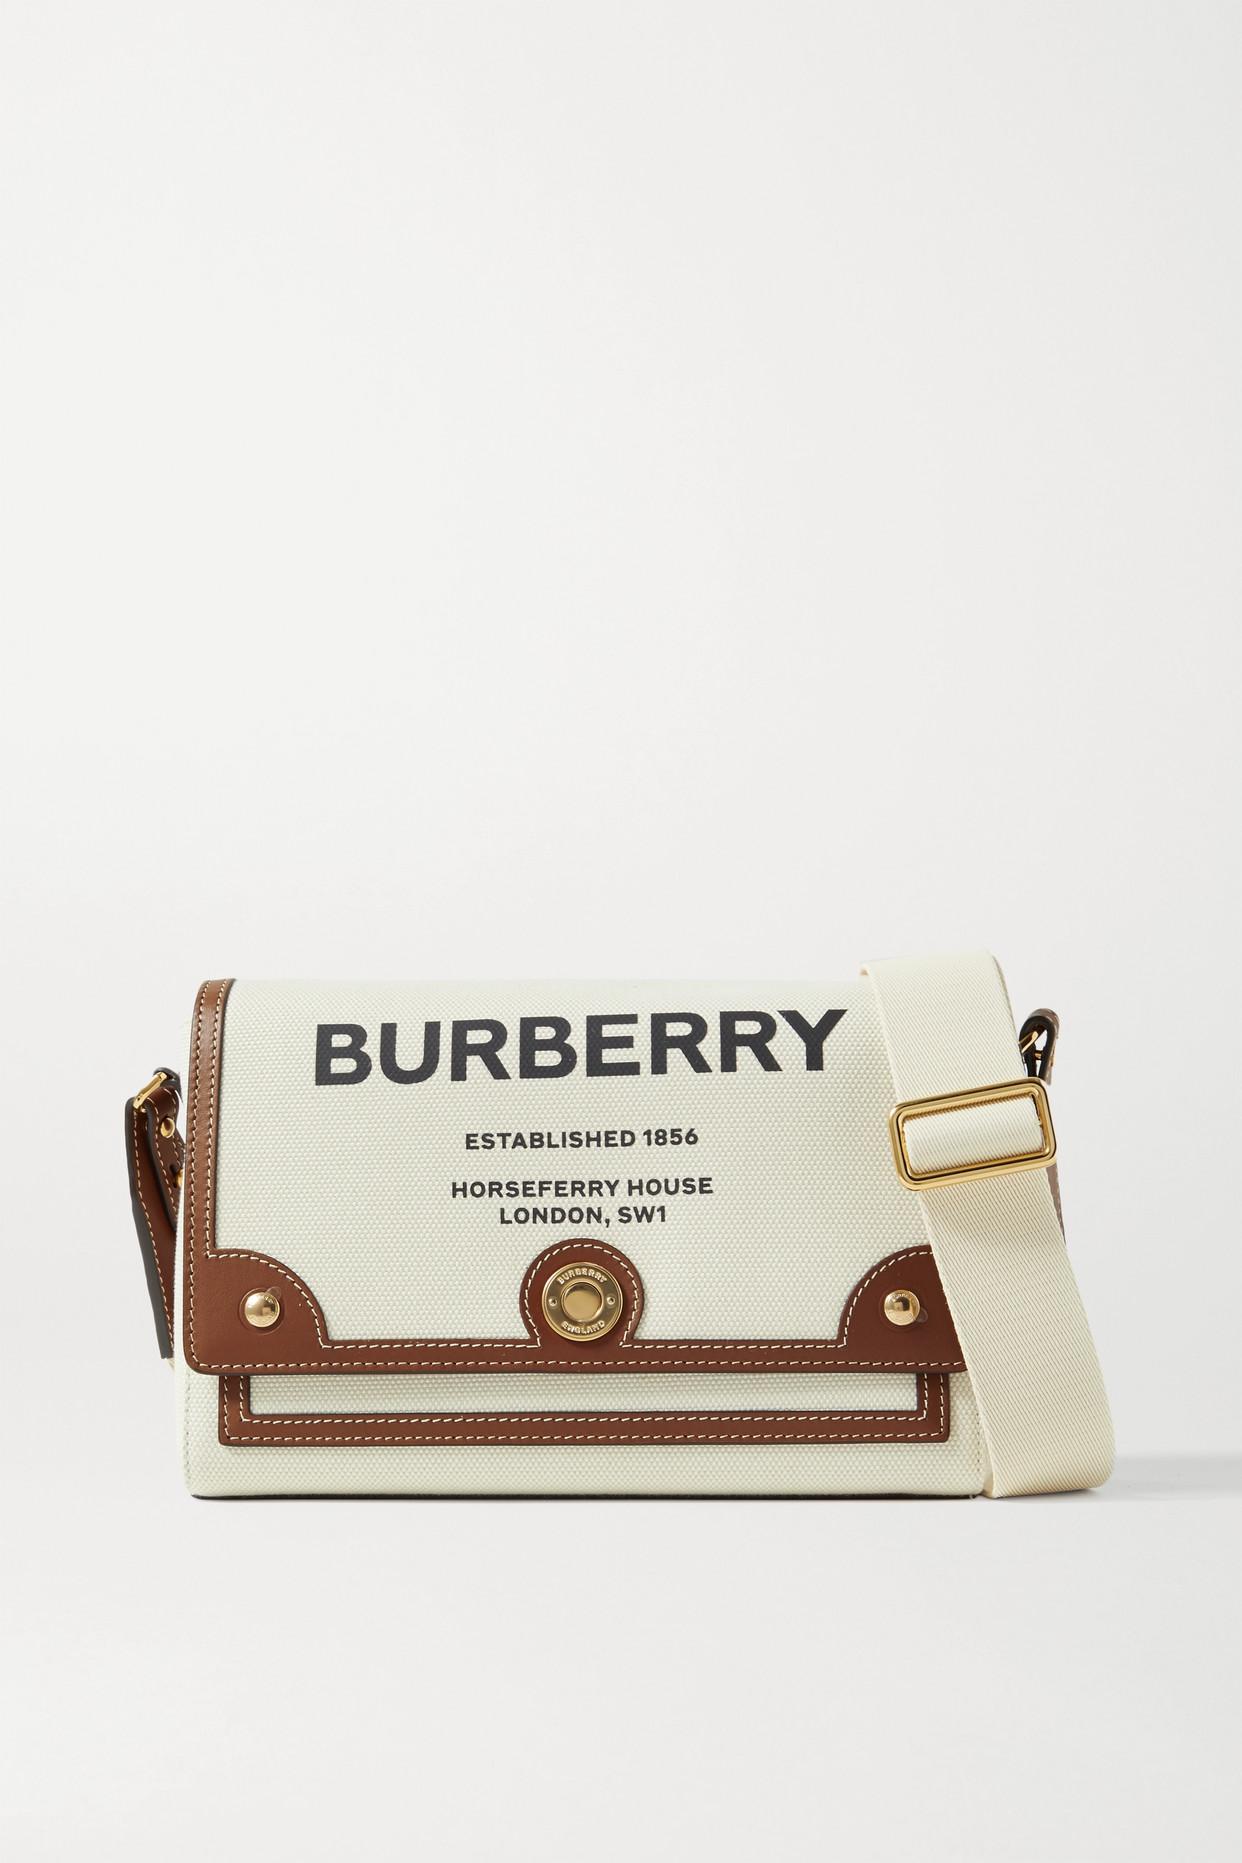 BURBERRY - Leather-trimmed Printed Canvas Shoulder Bag - Ecru - one size